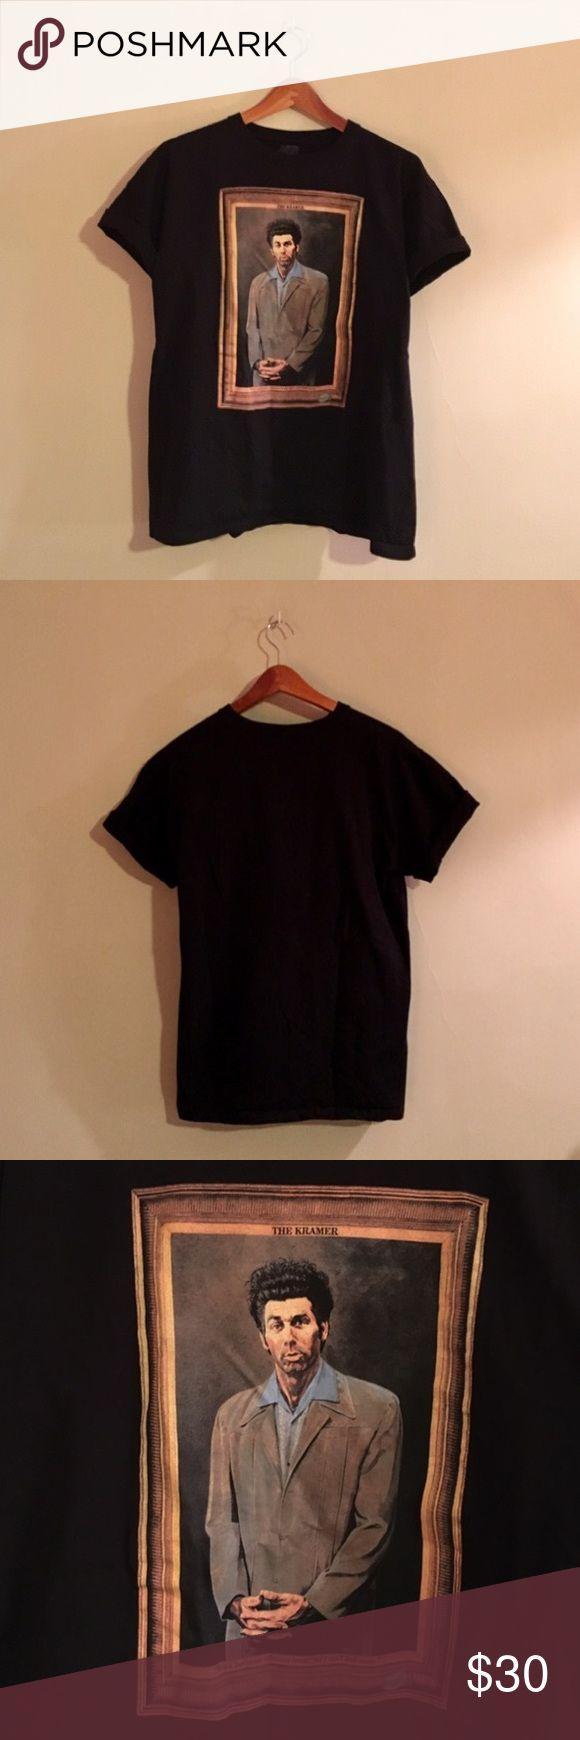 Vintage Kramer Seinfeld T-shirt Vintage style 90s Kramer Seinfeld shirt Vintage Shirts Tees - Short Sleeve